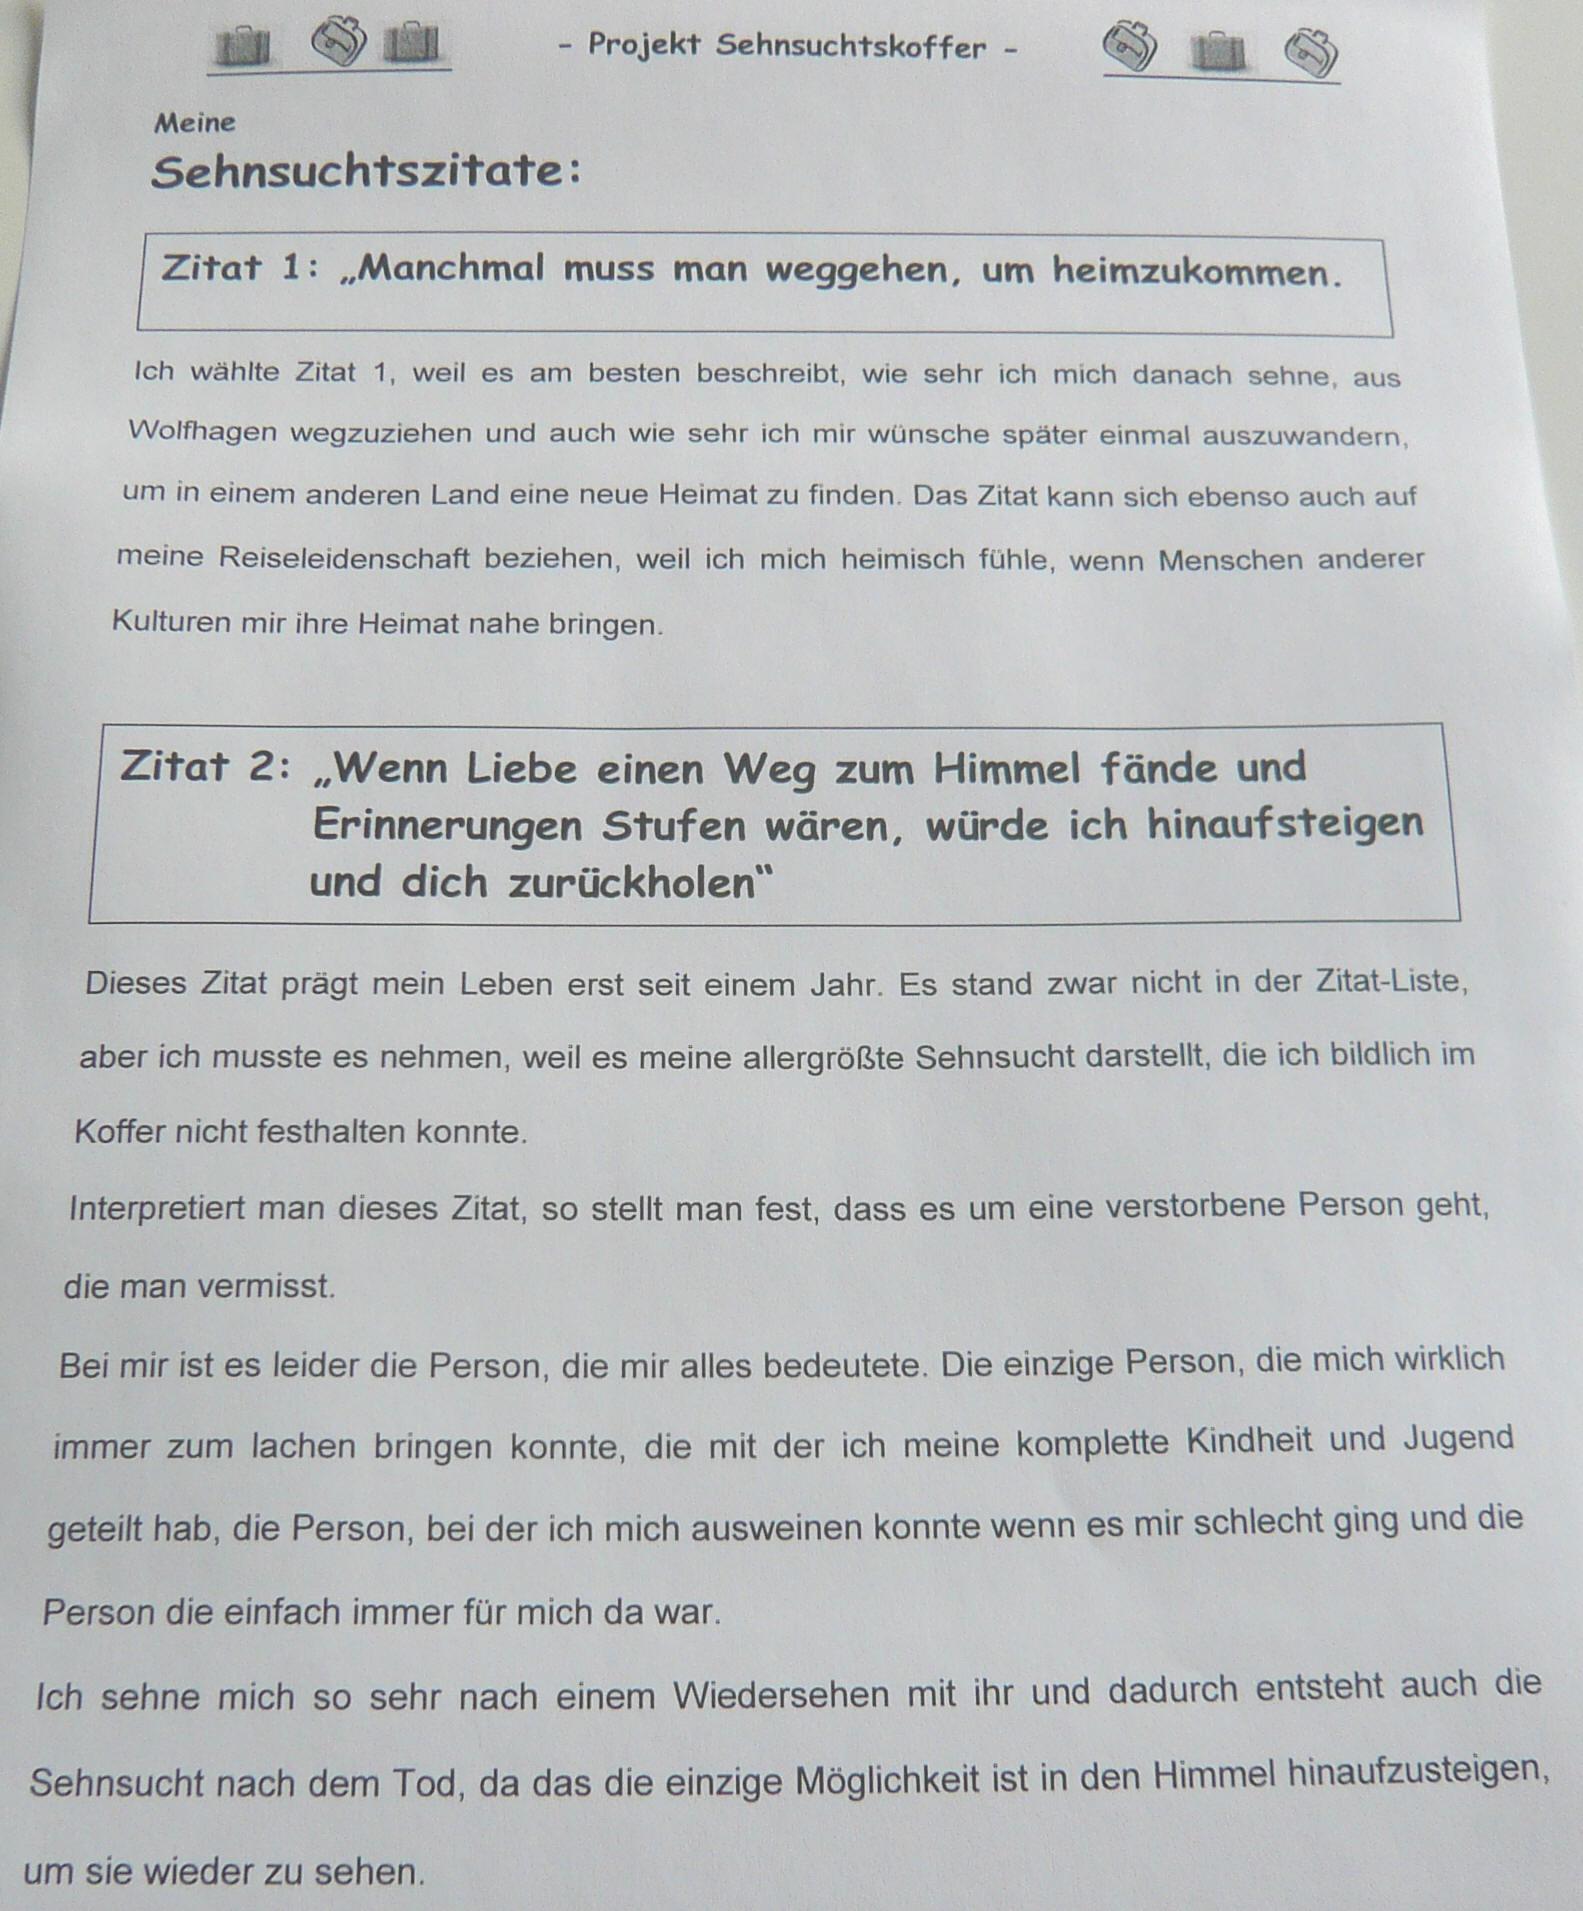 Awesome Julius Caesar Zitate Arbeitsblatt Adornment - Mathe ...